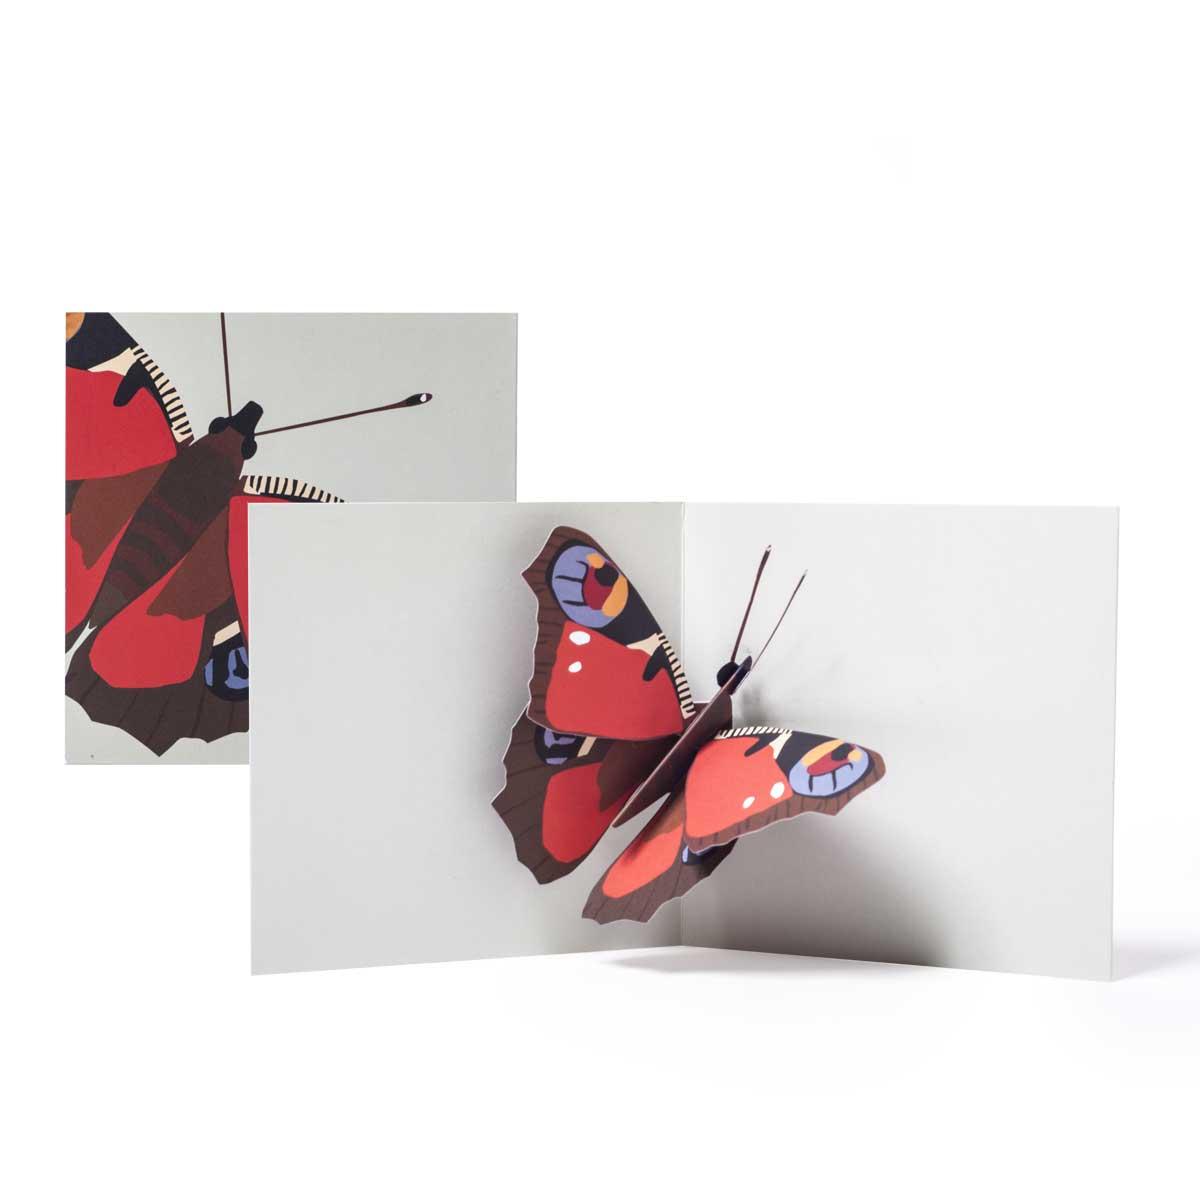 2-to-tango_red-butterfly_MaikeBiederstaedt.jpg